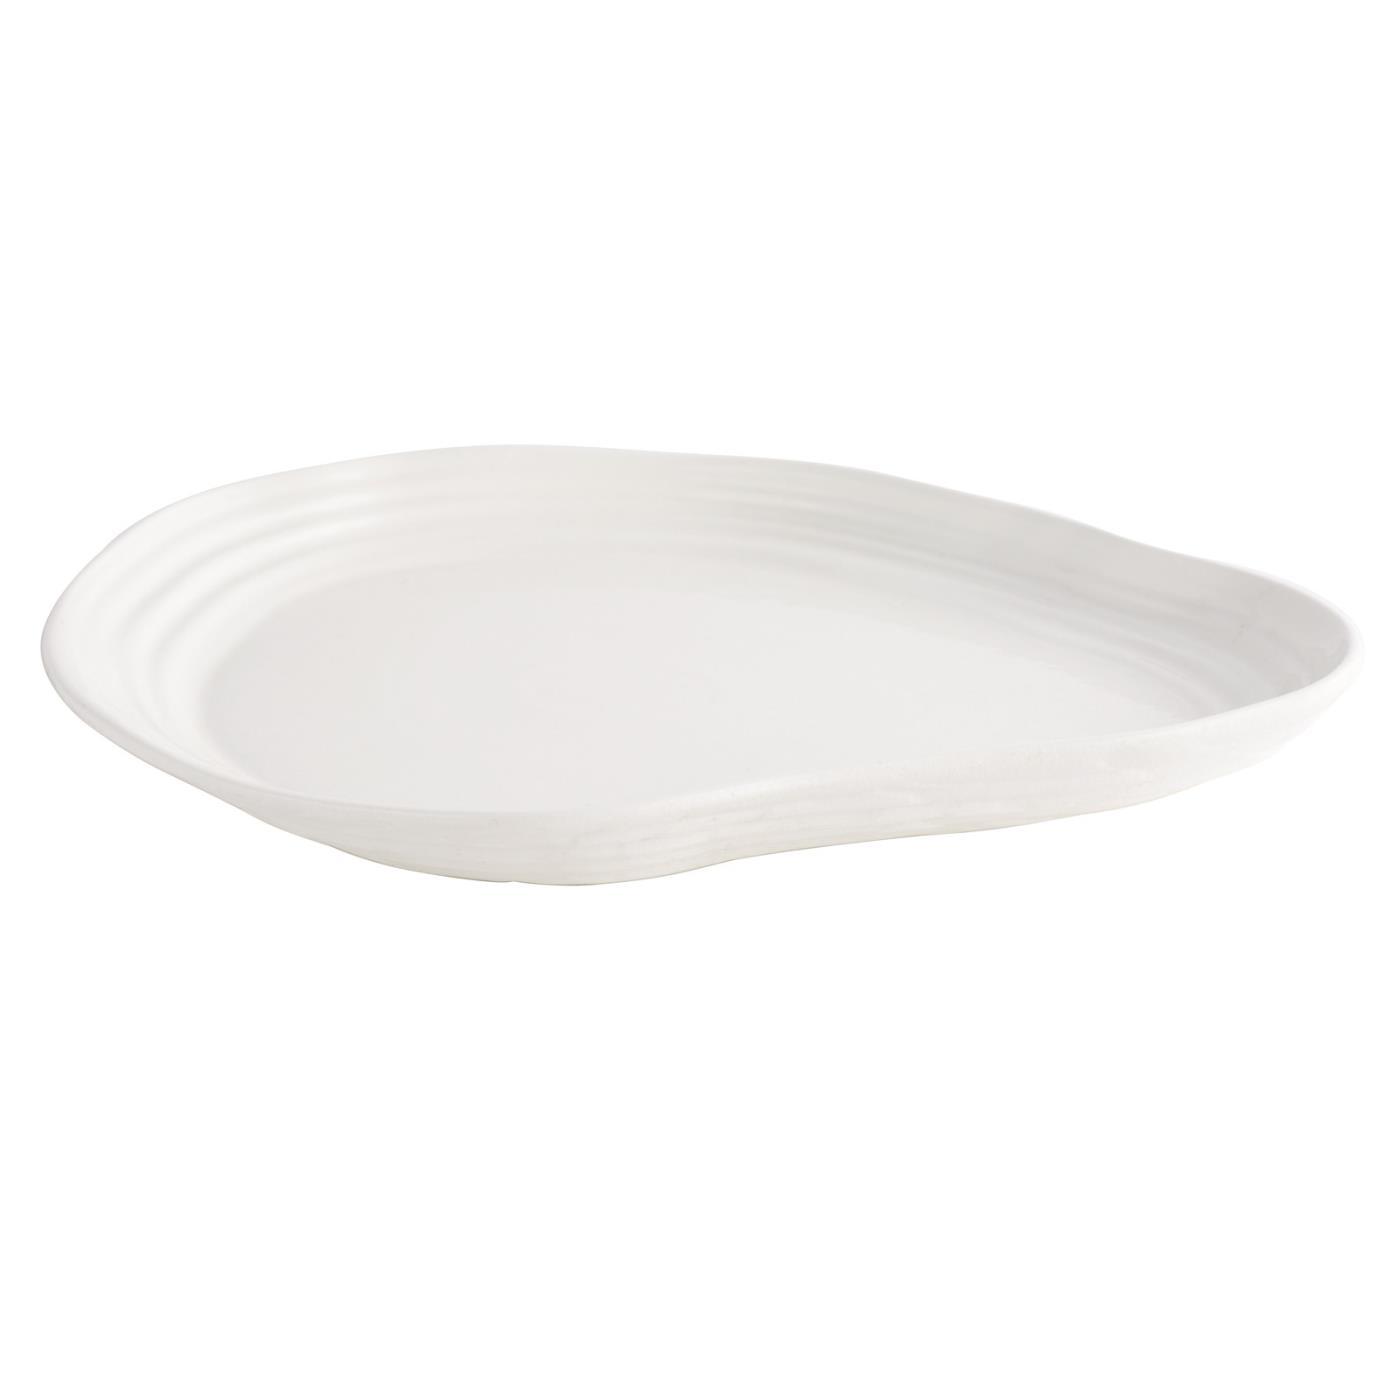 Elevation Platter